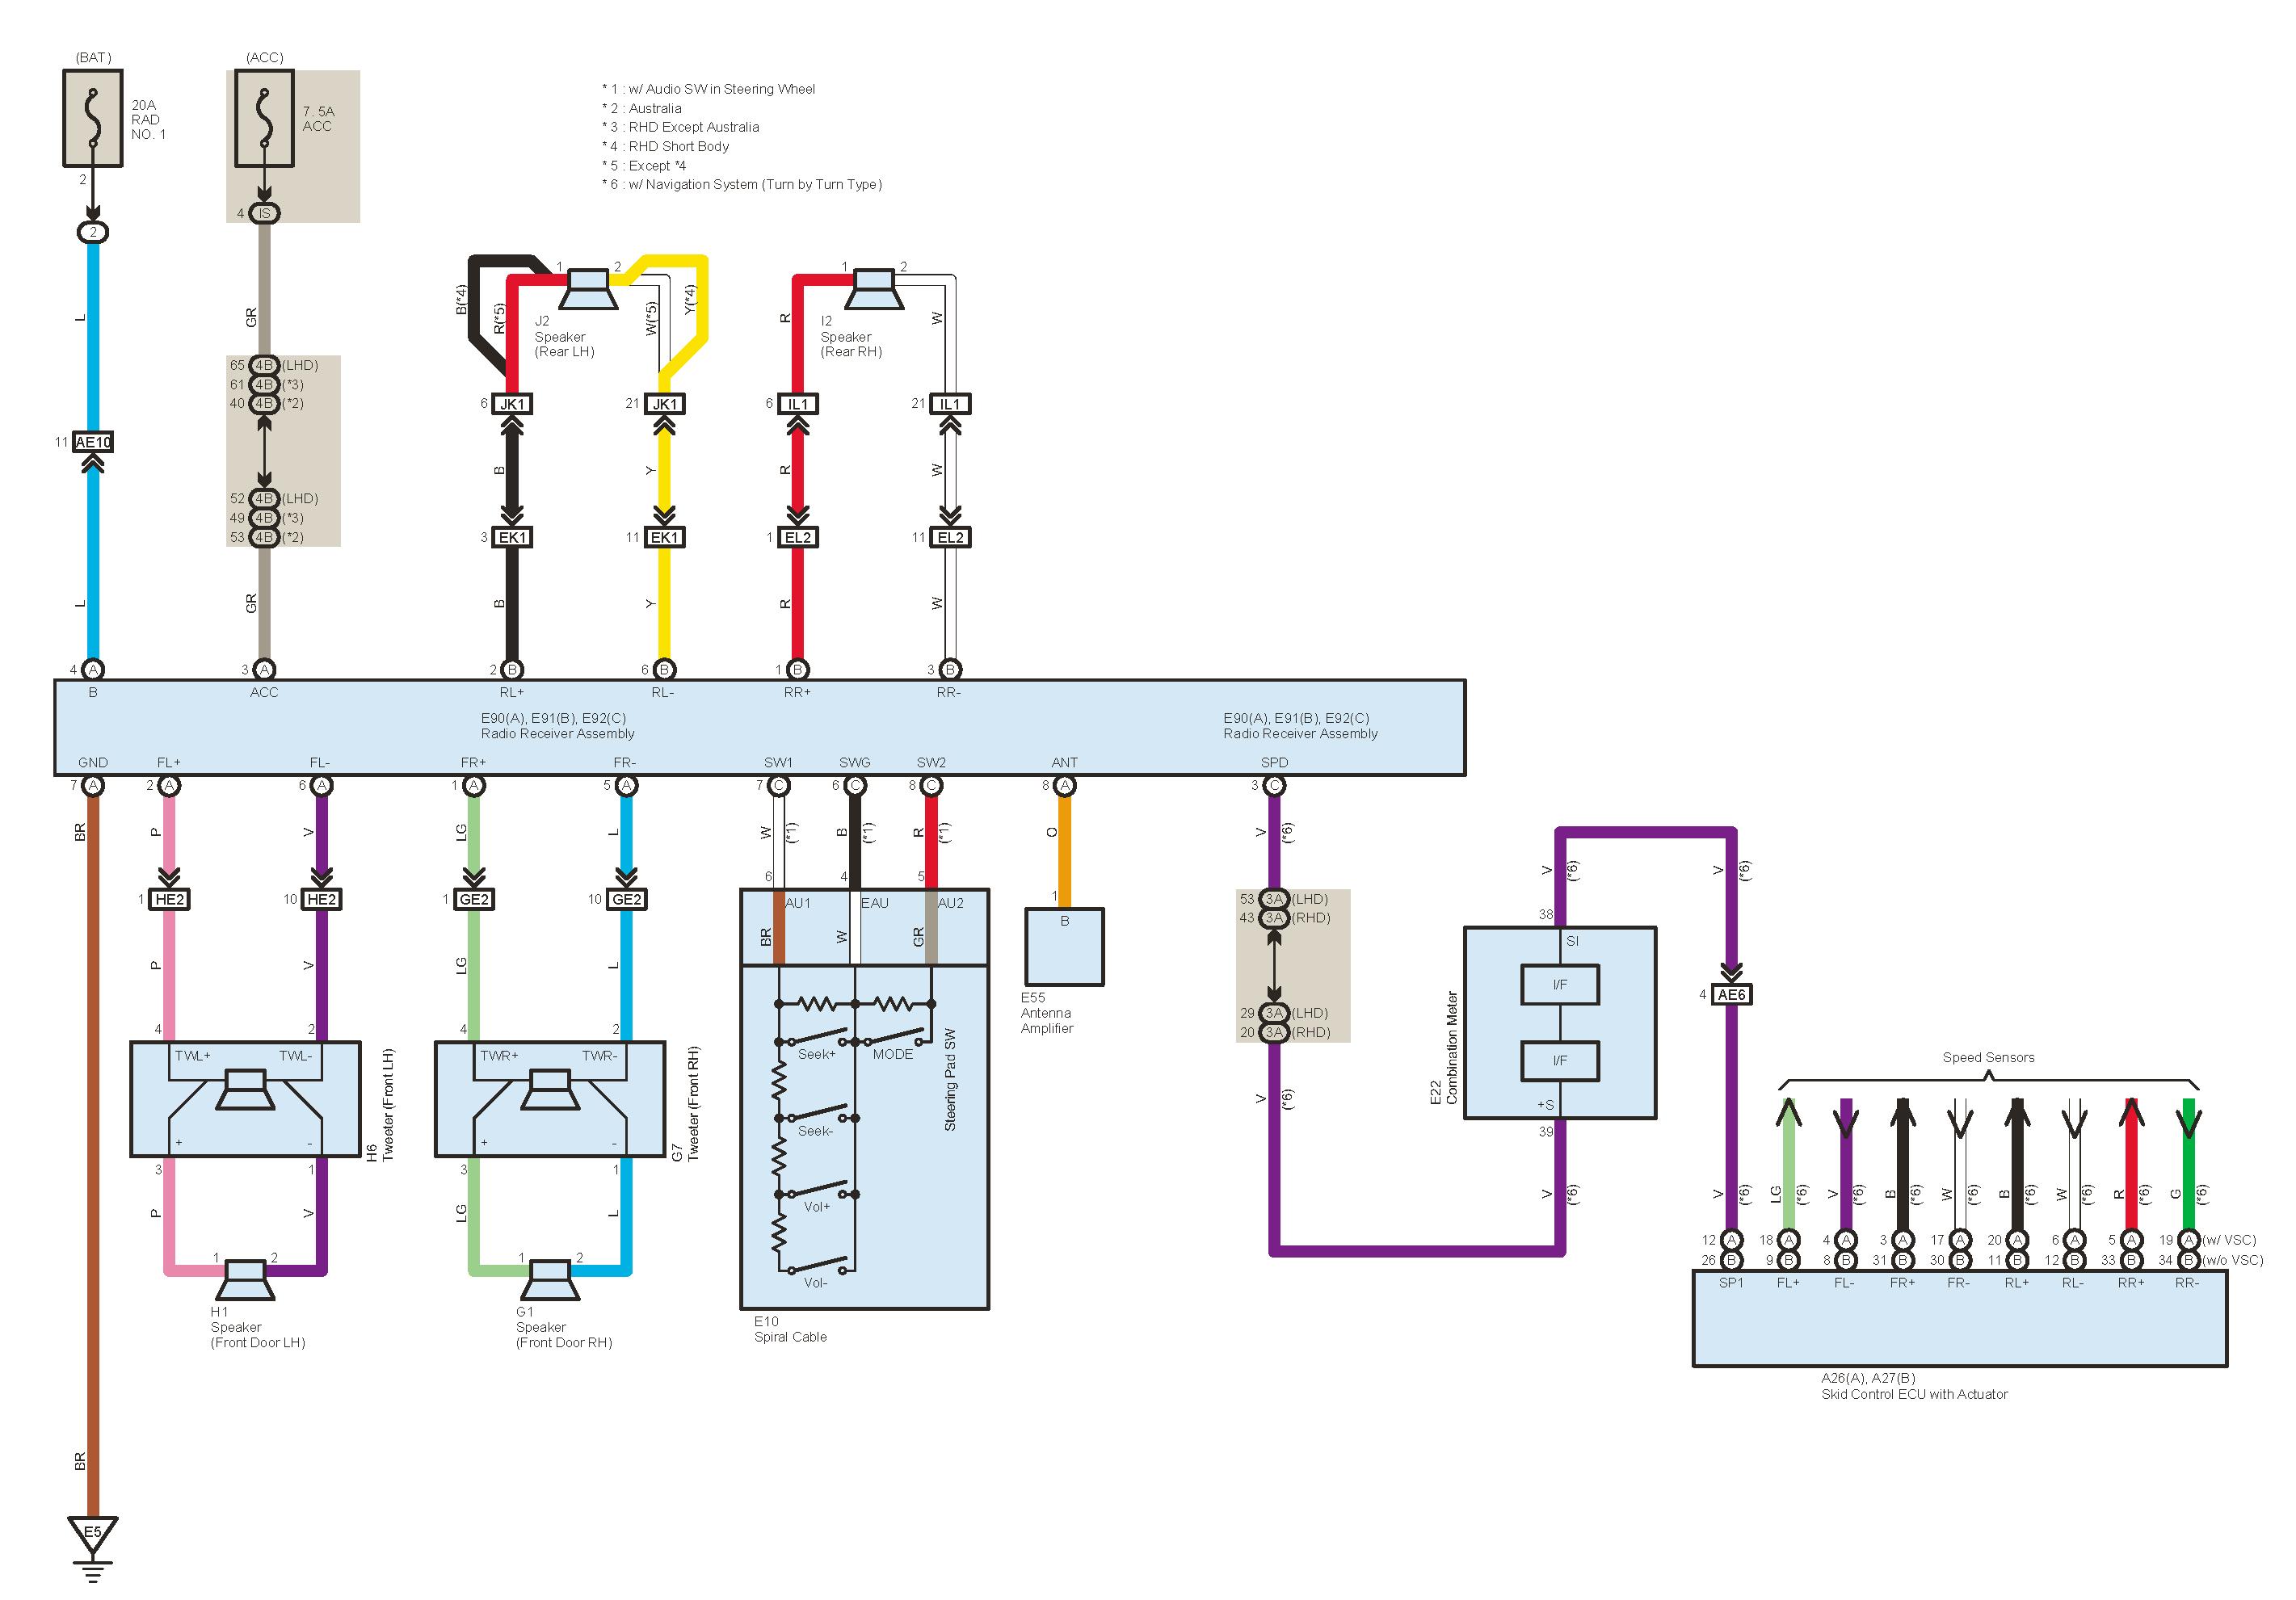 Fantastic 2001 Toyota Corolla Wiring Diagram Wiring Diagram Database Wiring Cloud Eachirenstrafr09Org